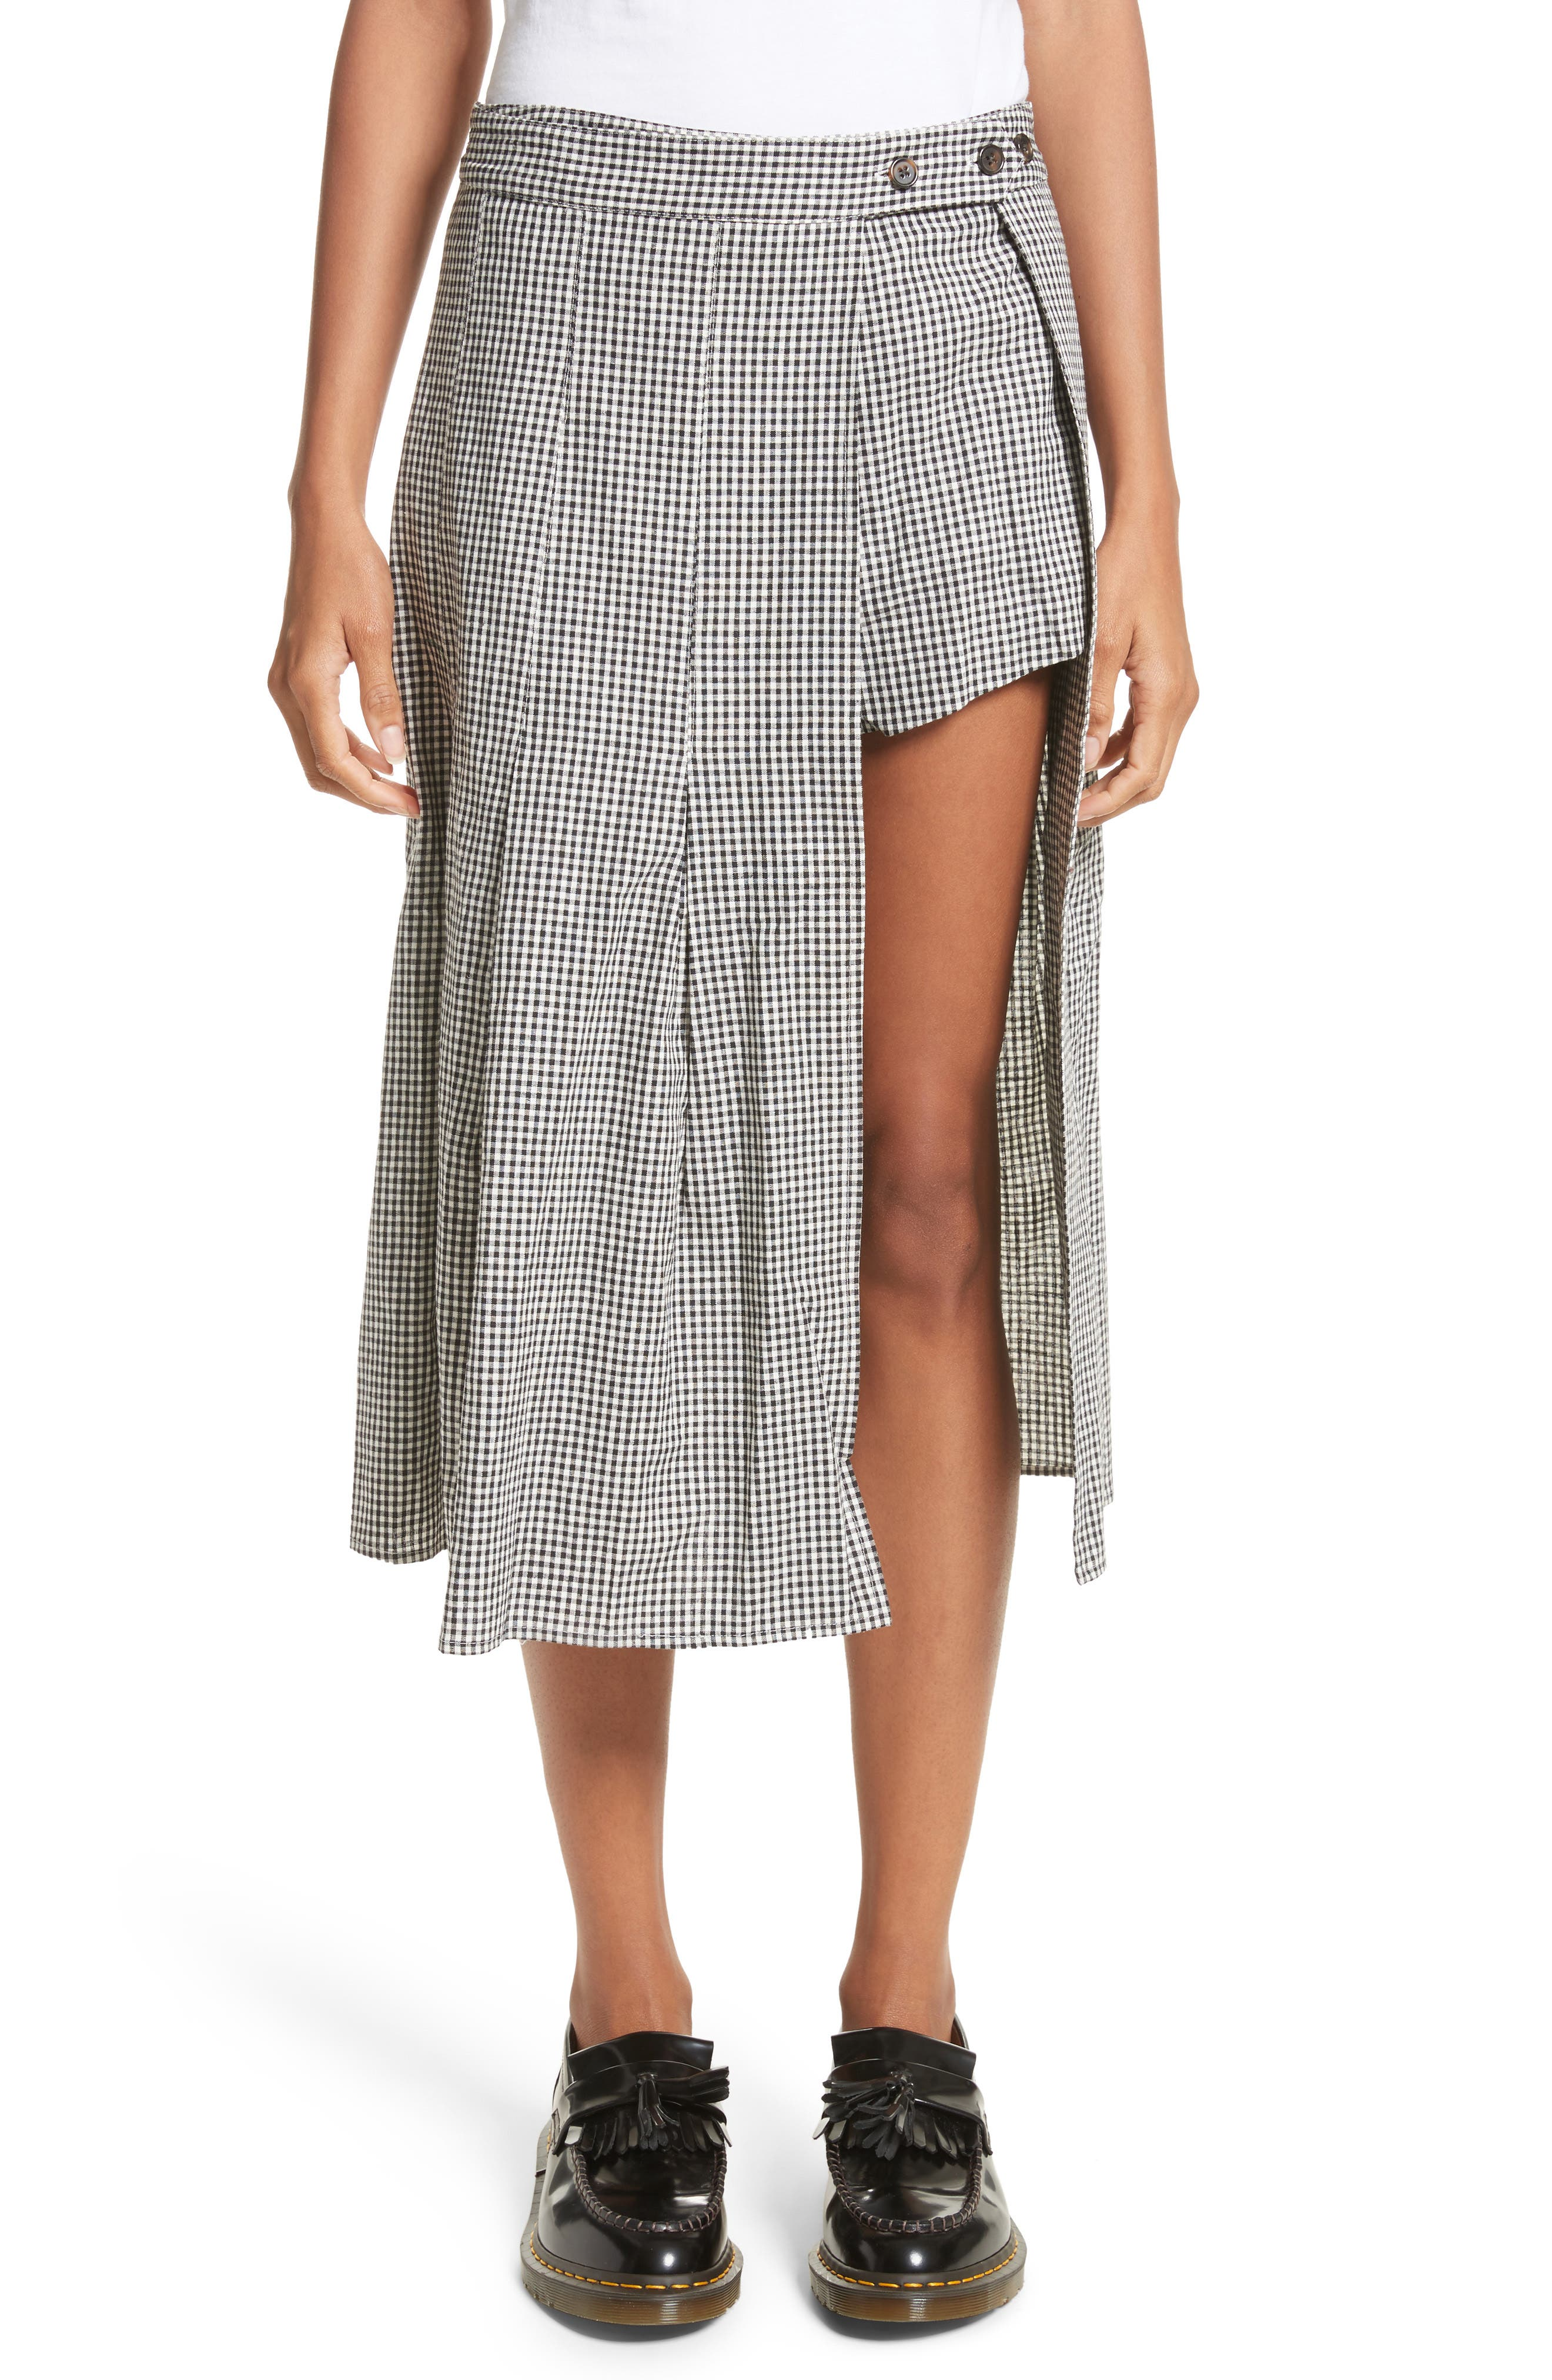 Alternate Image 1 Selected - Sandy Liang Uniform Gingham Linen & Cotton Skirt